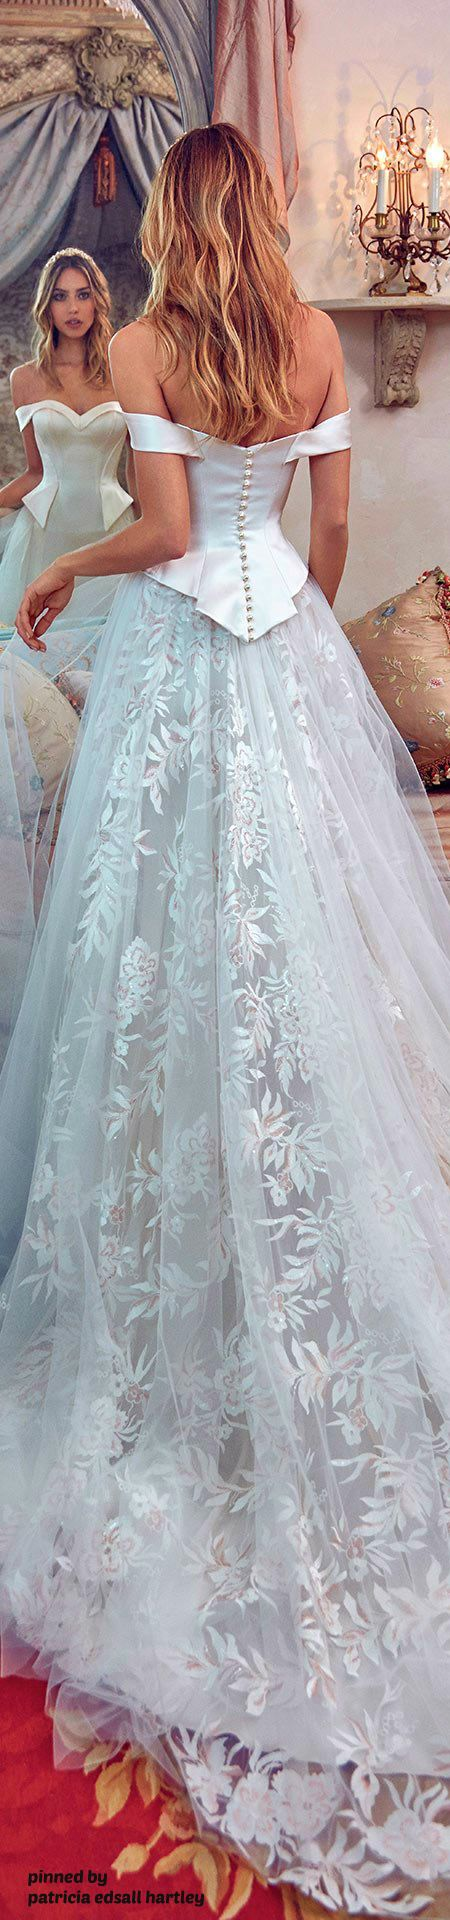 Galia Lahav Collection- Le Secret Royal 2017  #vestidodenovia | #trajesdenovio | vestidos de novia para gorditas | vestidos de novia cortos  http://amzn.to/29aGZWo